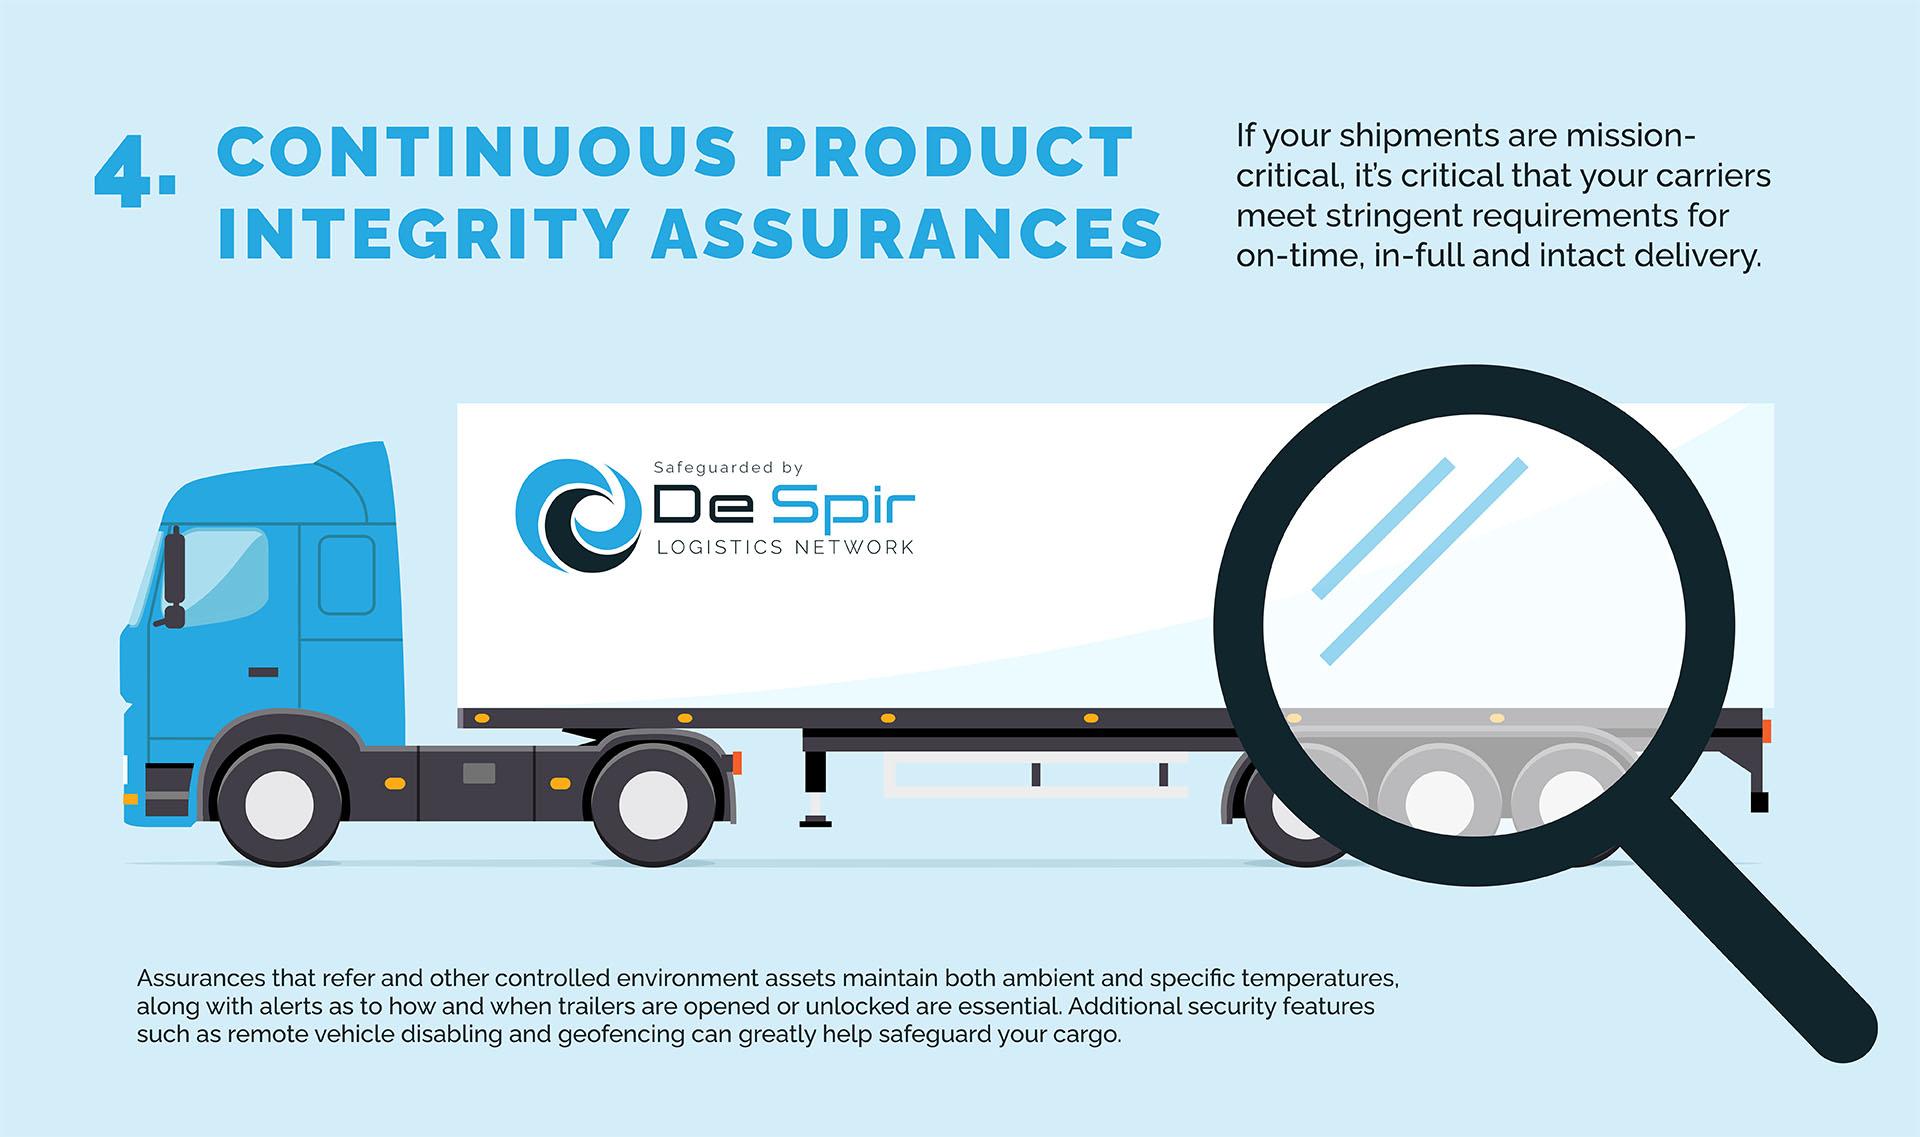 Continuous Product Integrity Assurances